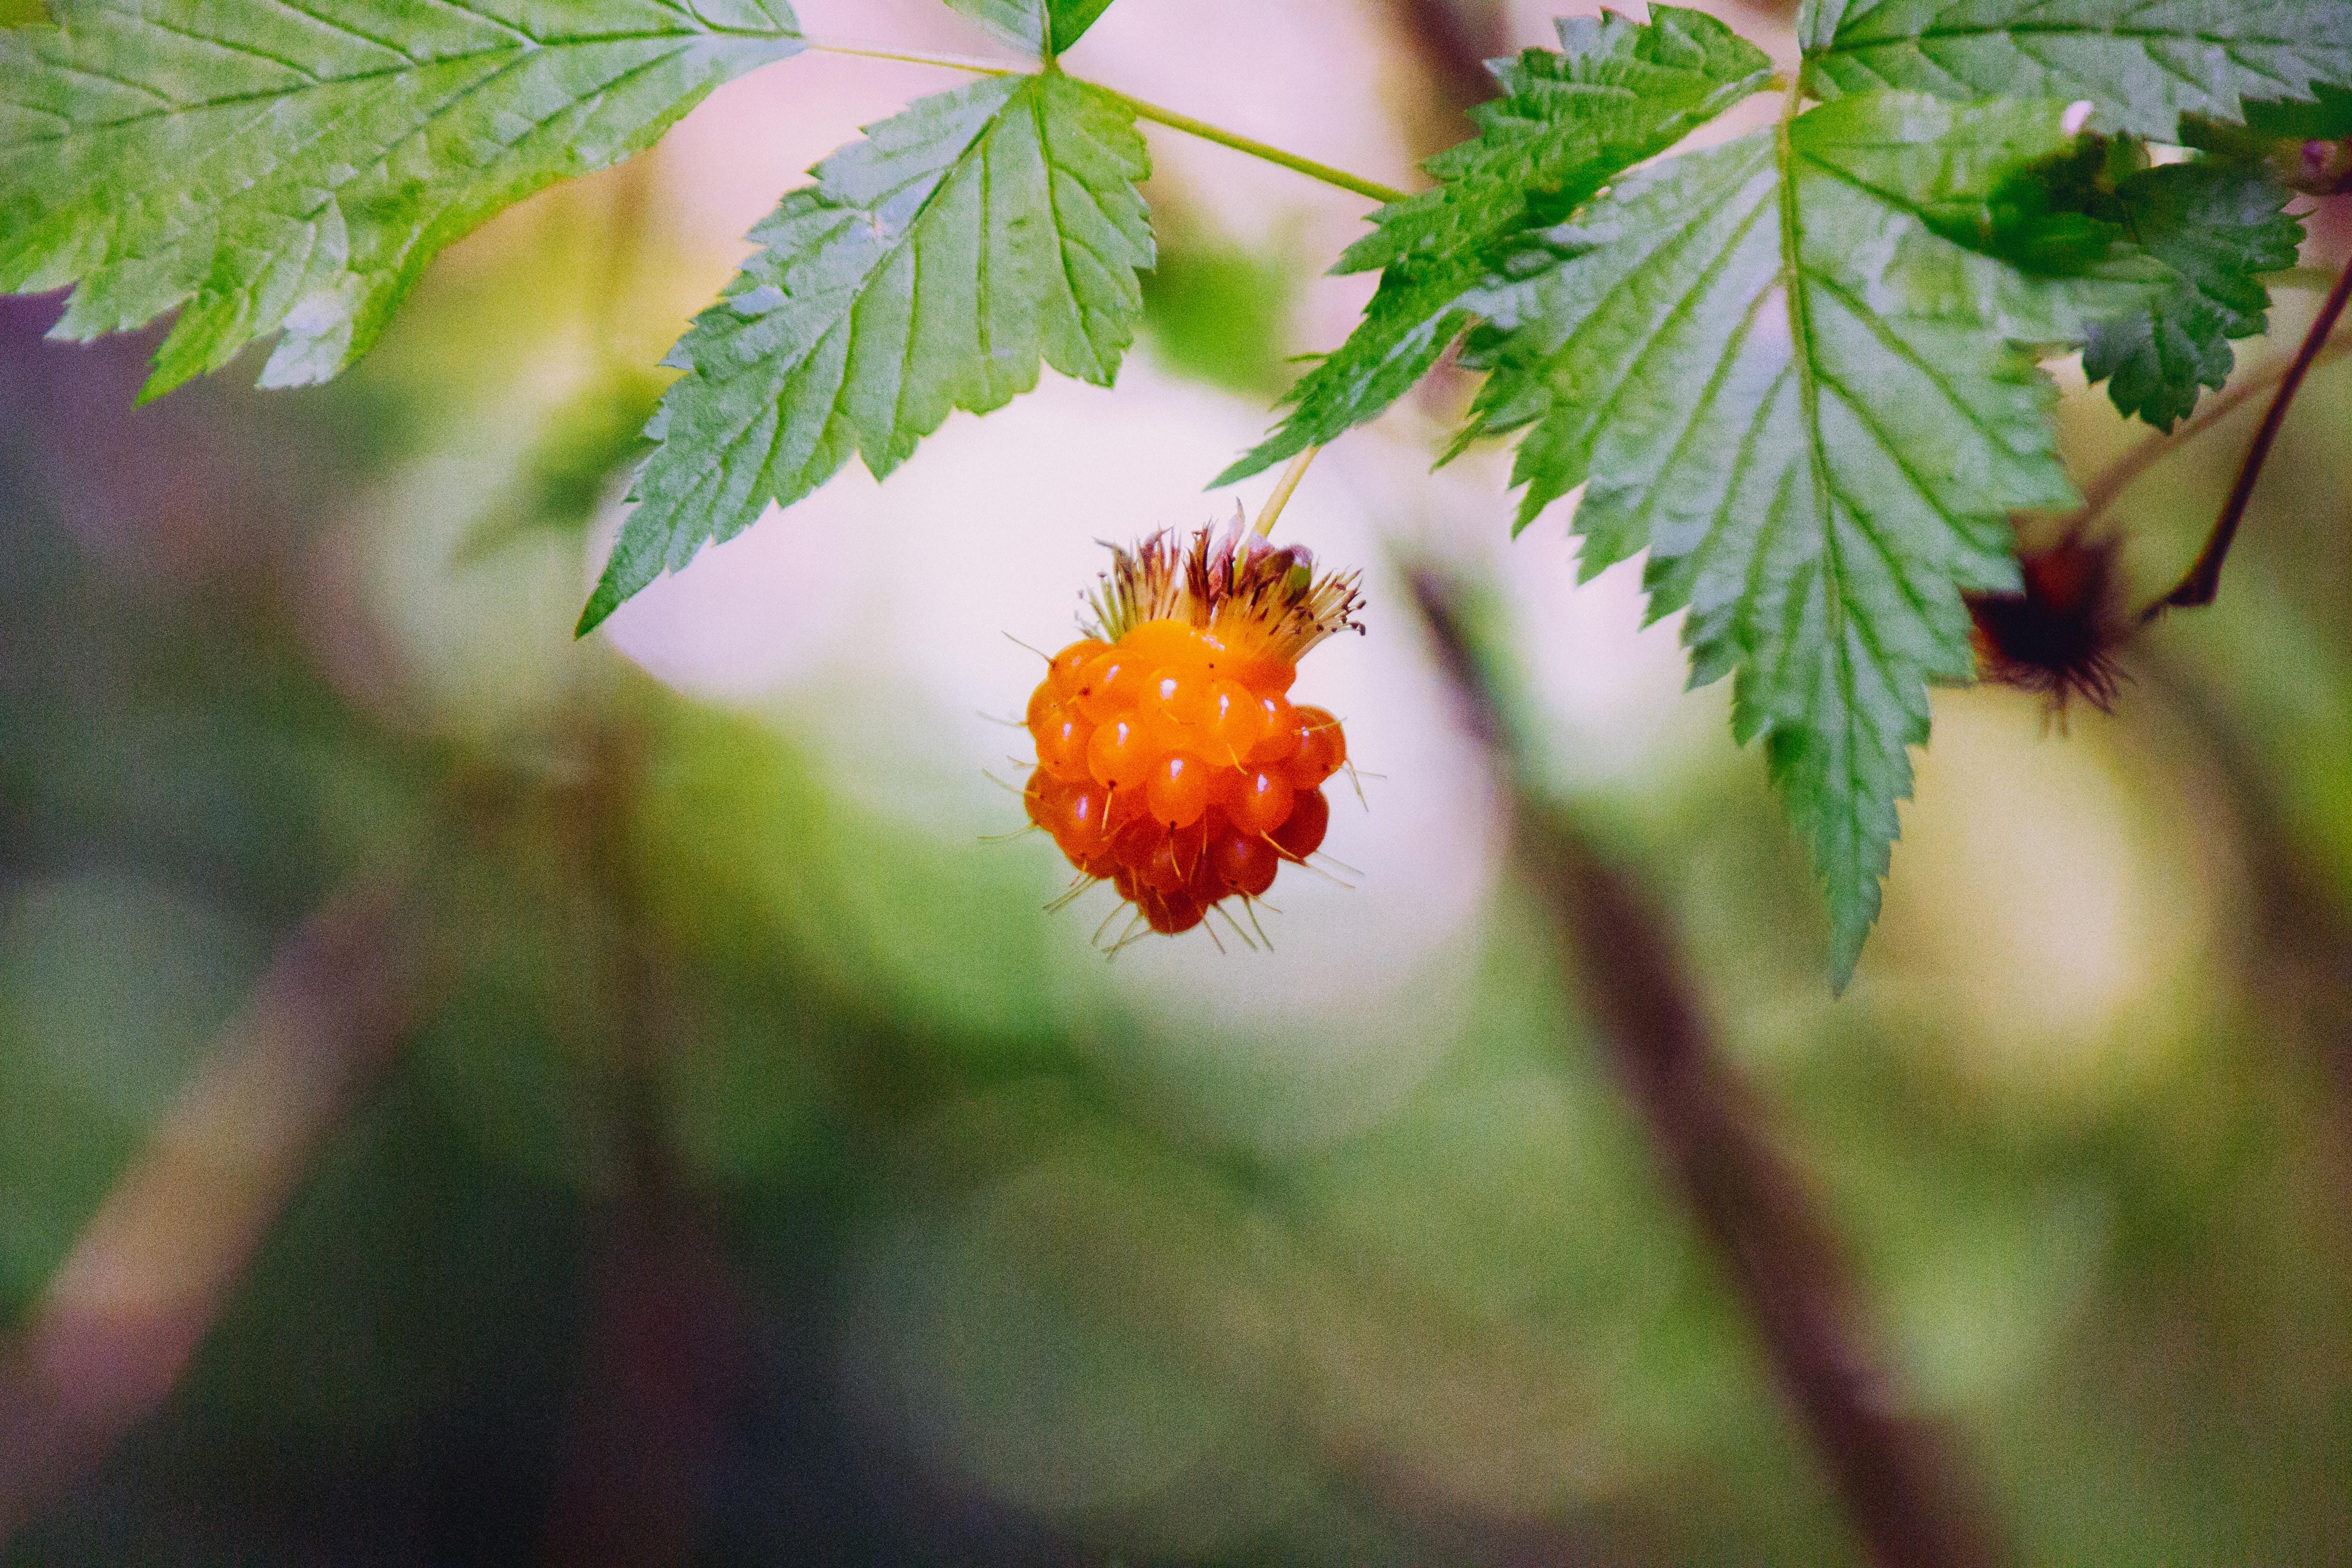 orange fruit in selective focus photography